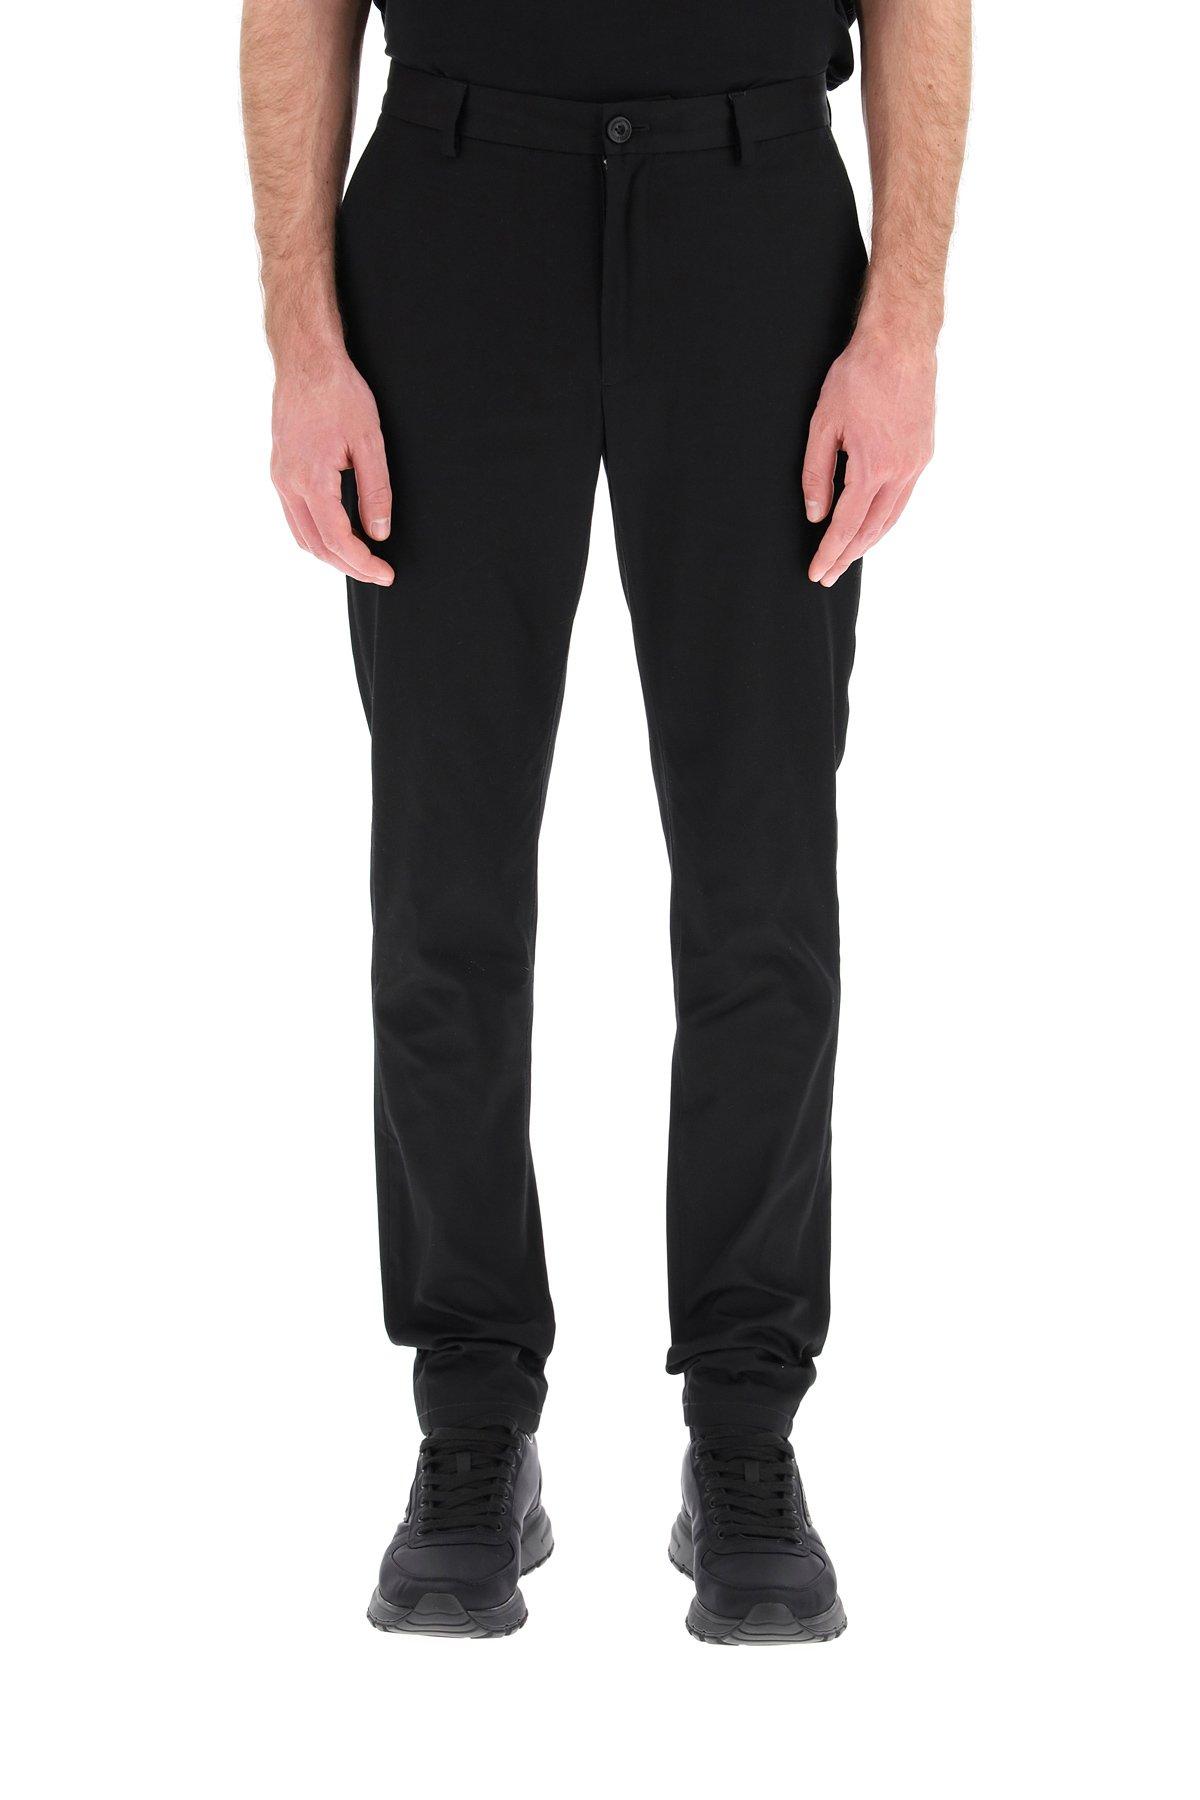 Burberry pantaloni in cotone shibden